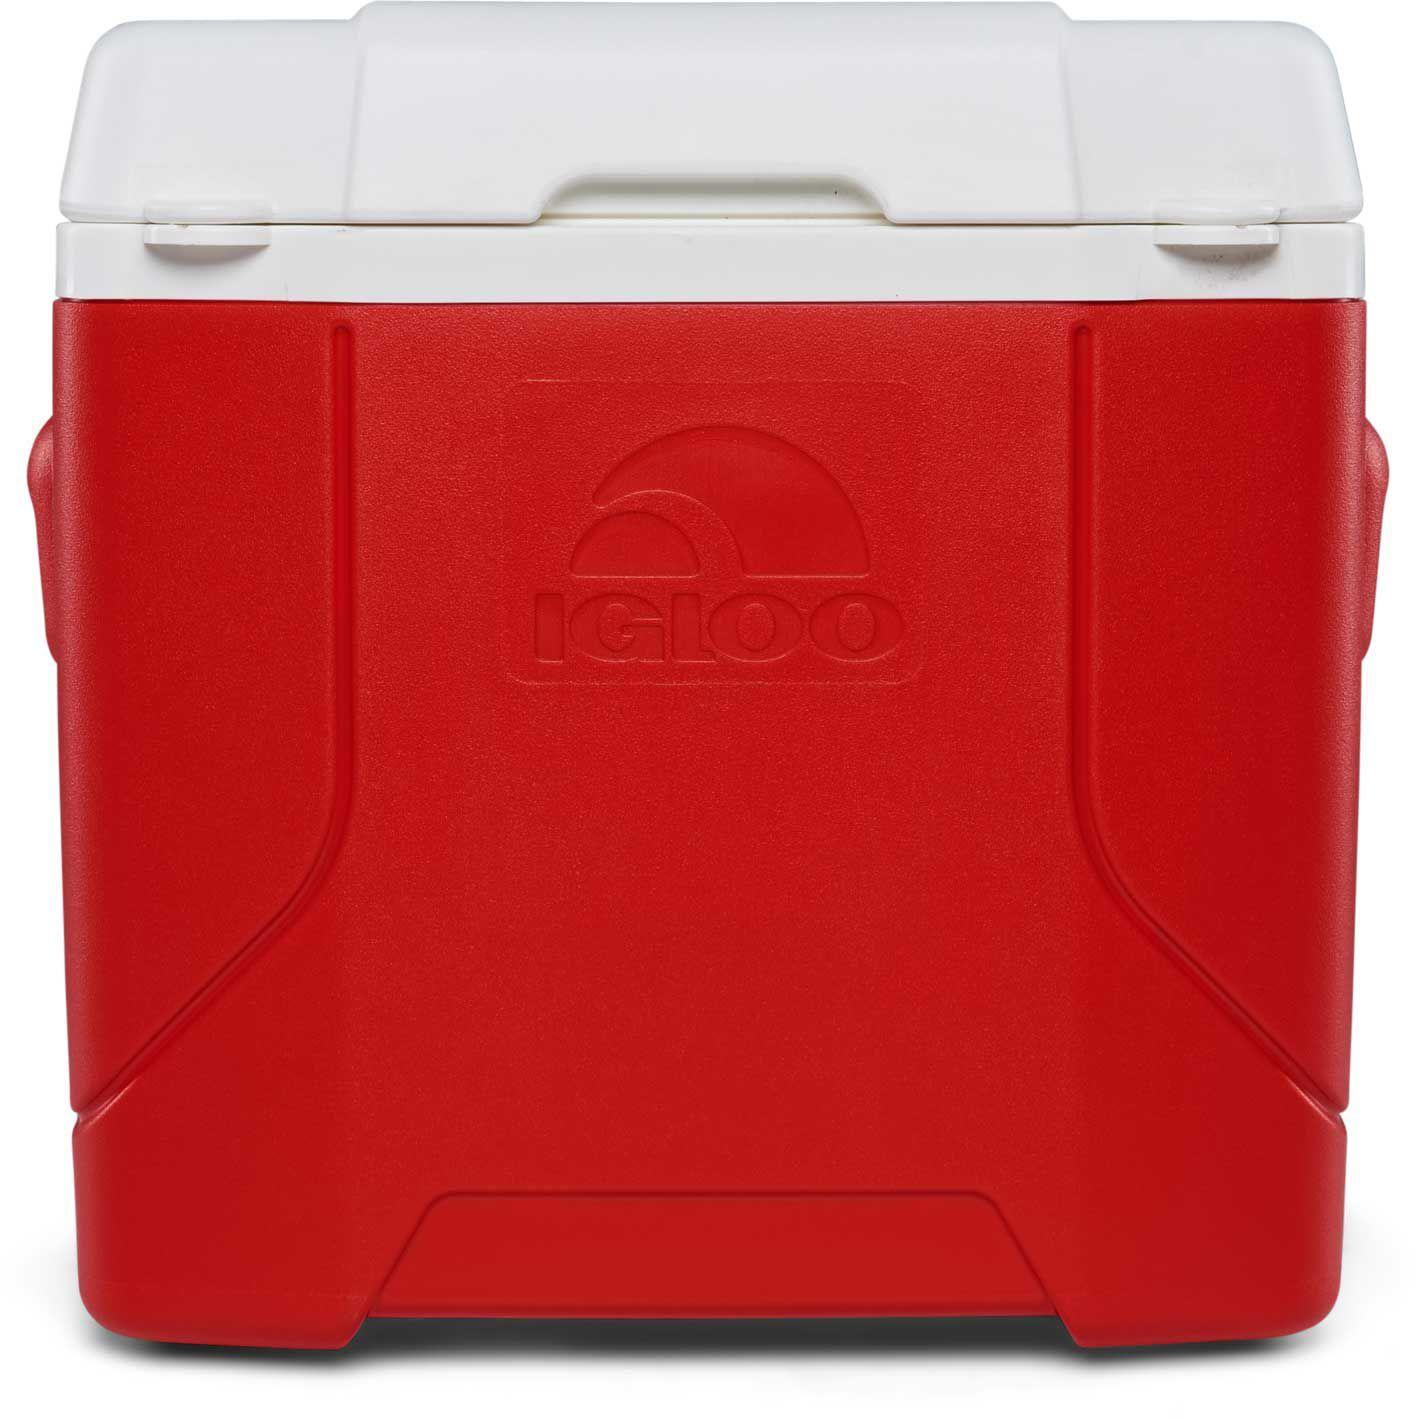 Igloo Profile 30 Quart Rolling Cooler, Red